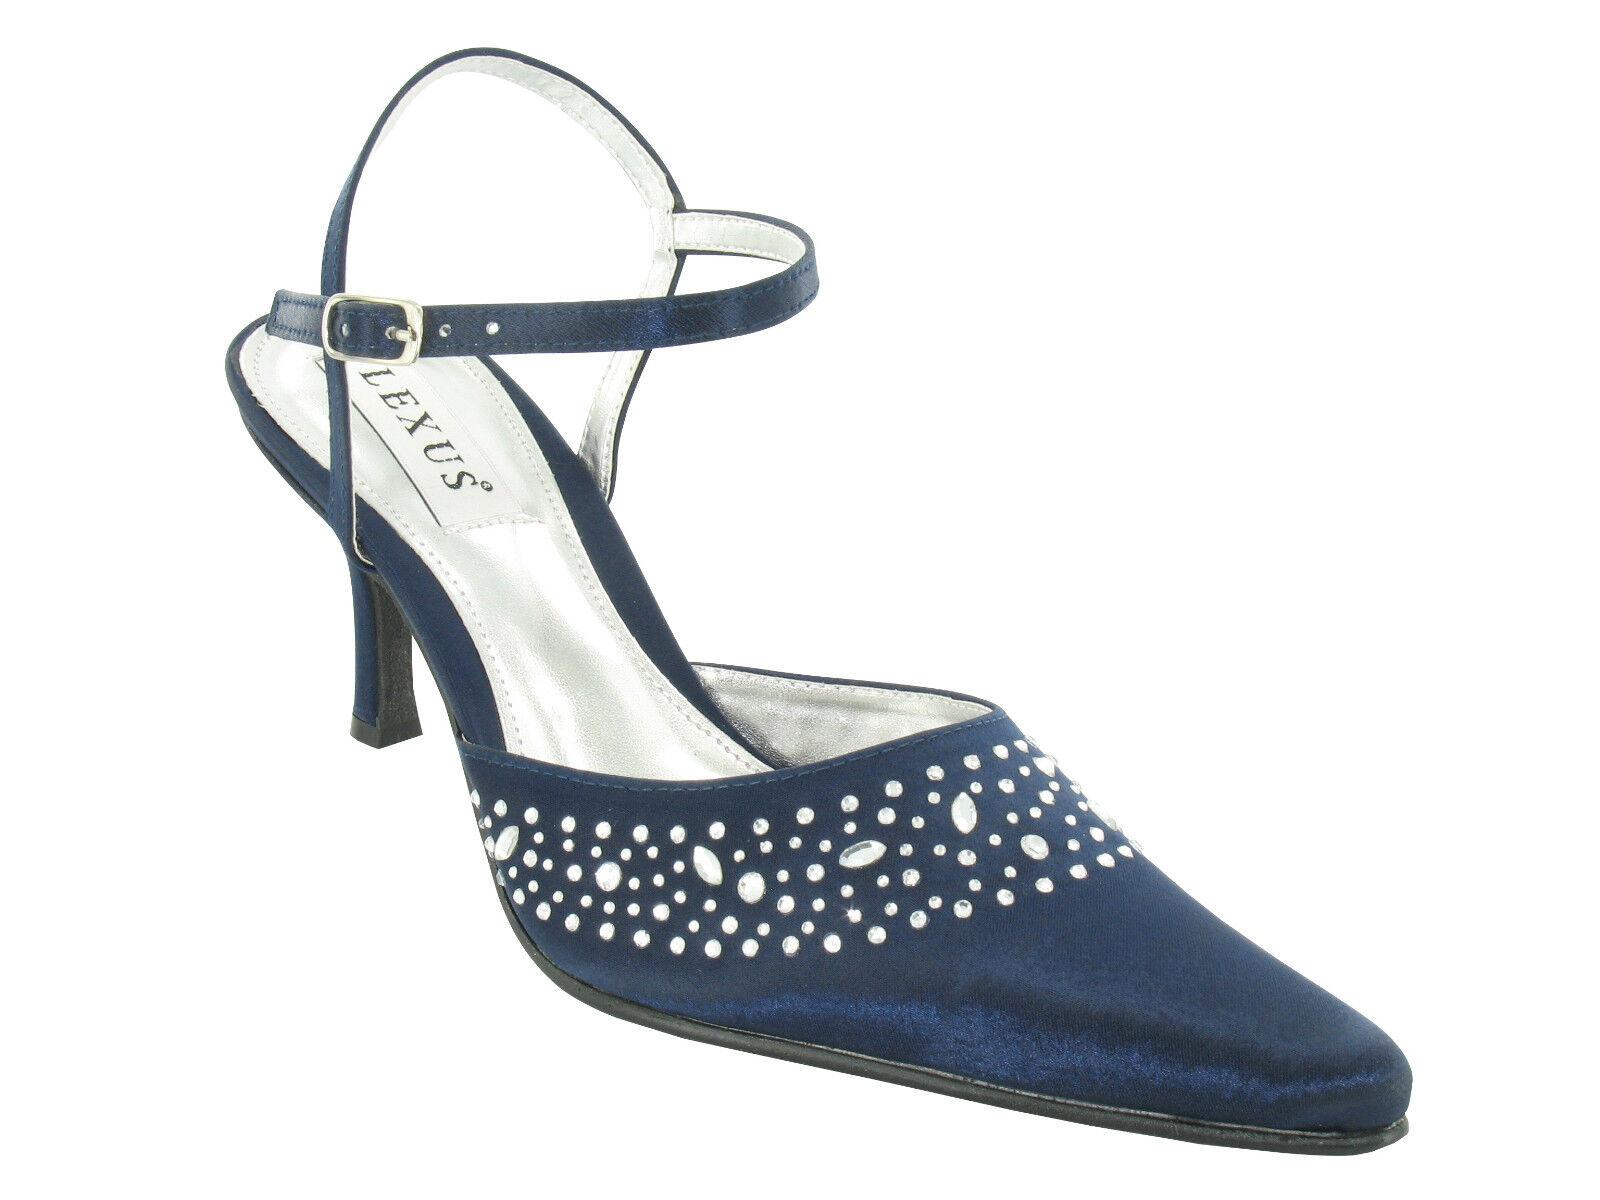 Ladies closed-toe shoe, heatseal diamantes- Light Grey Silver, Navy, Plum, Taupe